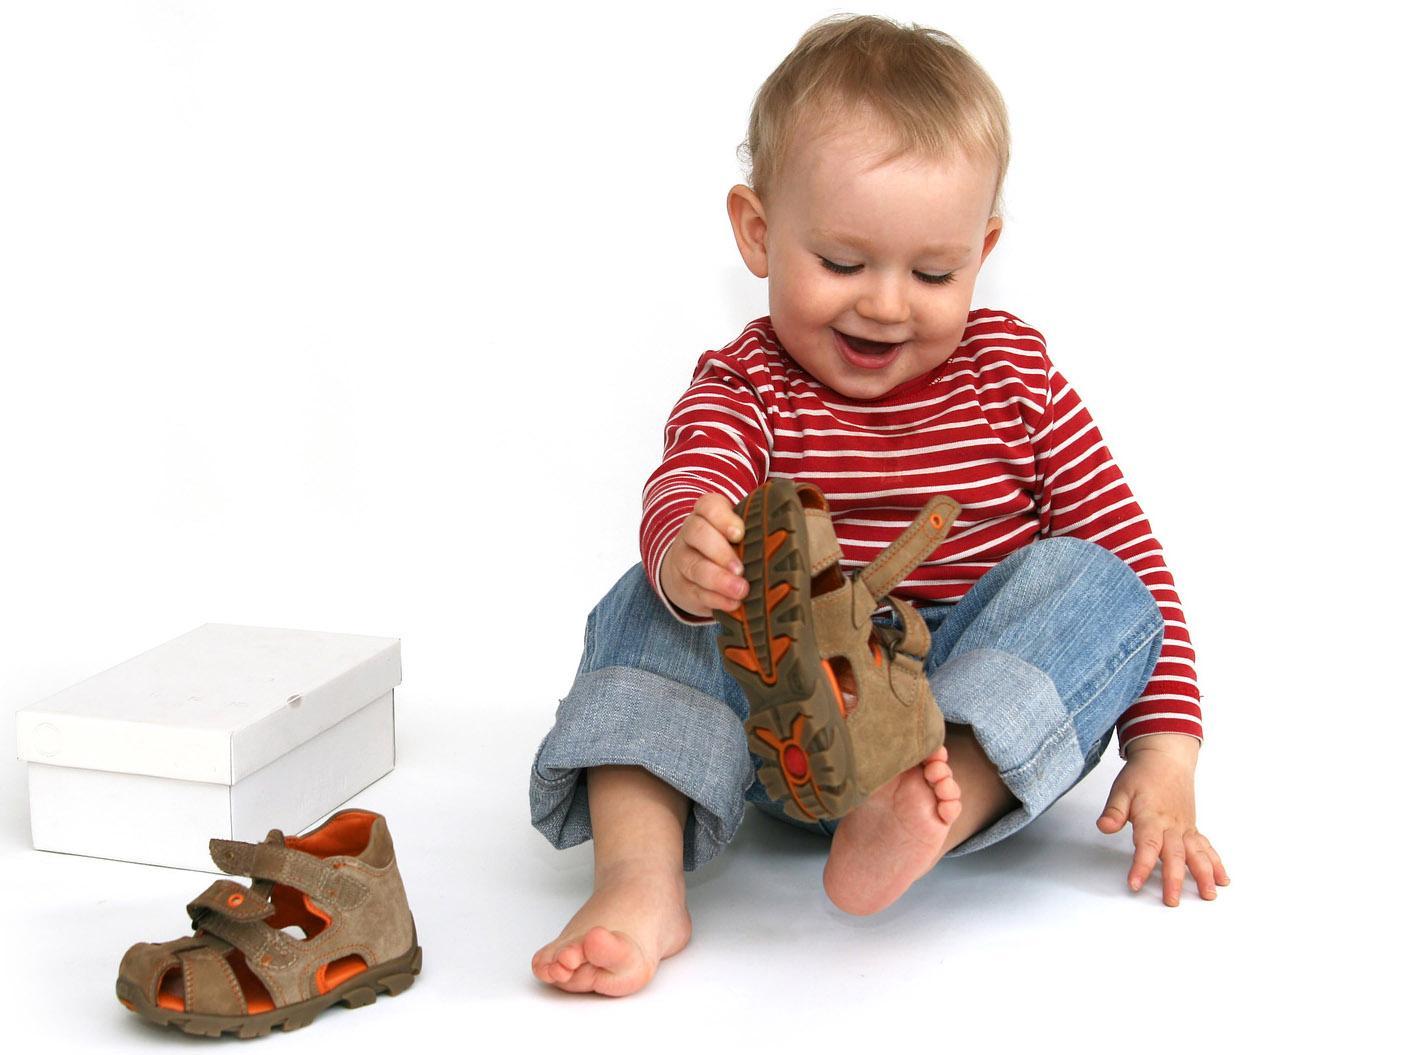 Pranzo Per Bambini 18 Mesi : Comportamento del bambino 12 18 mesi bimbi sani e belli